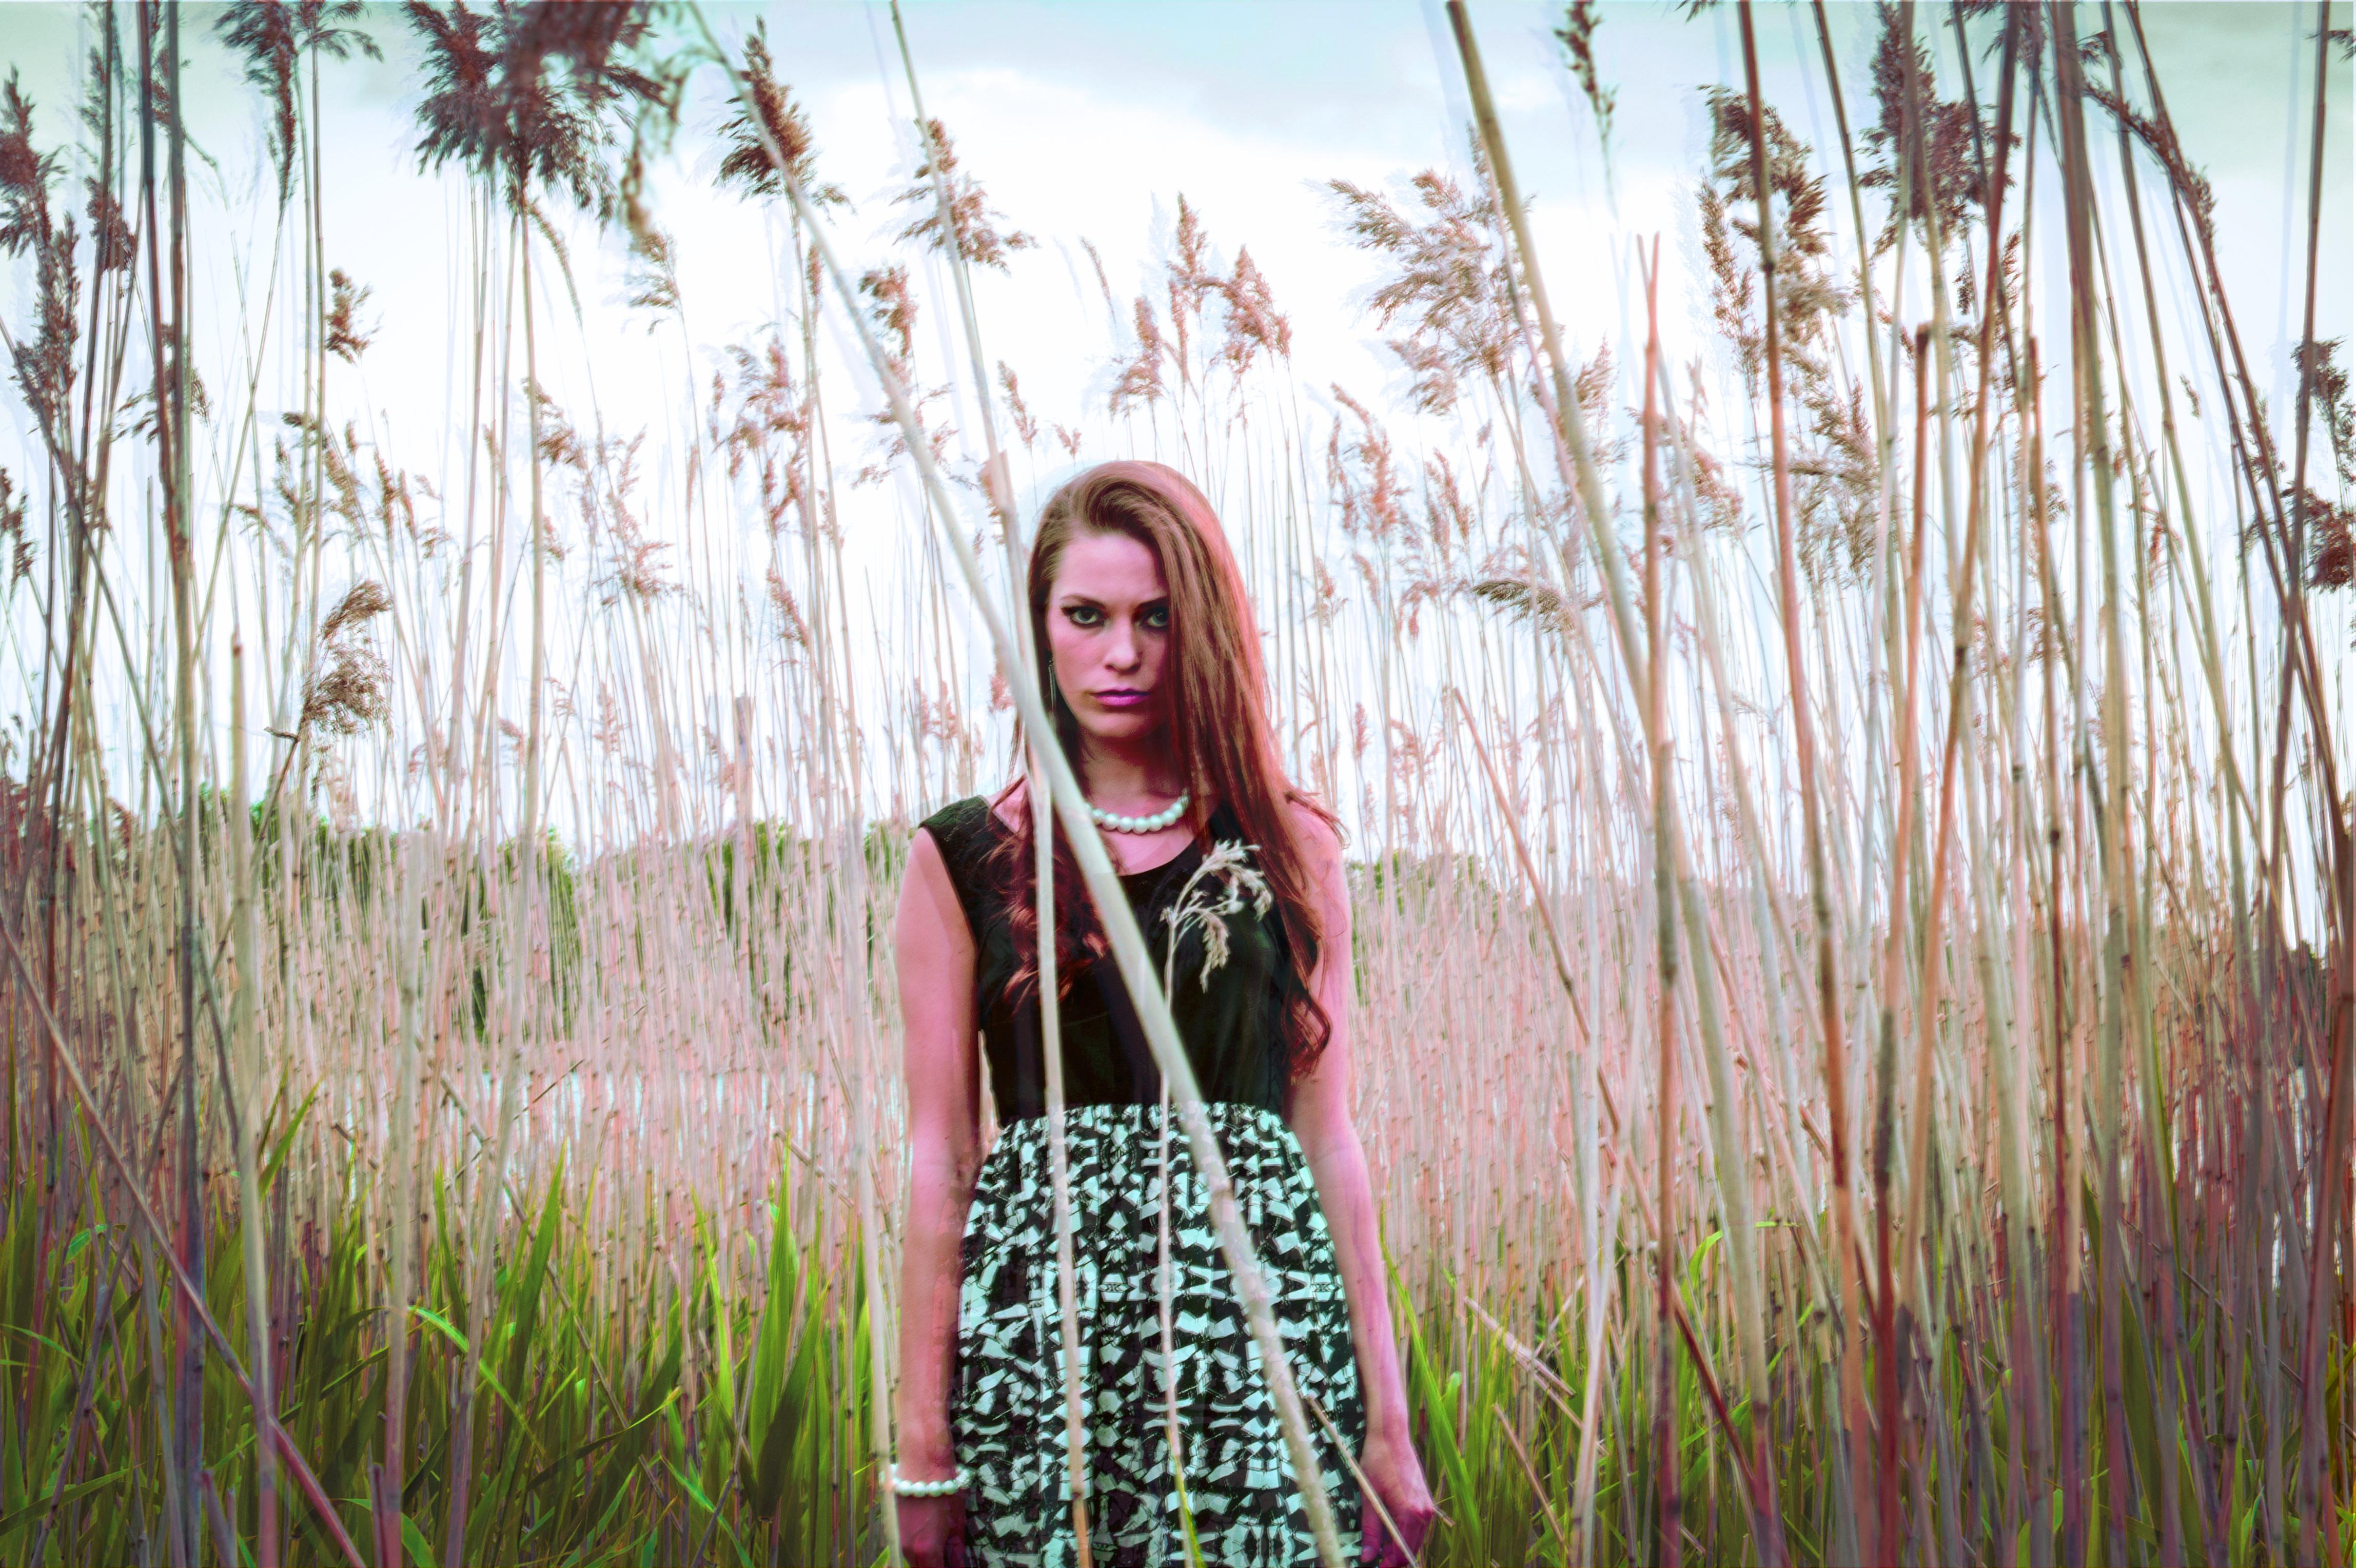 Summertime Sadness 1